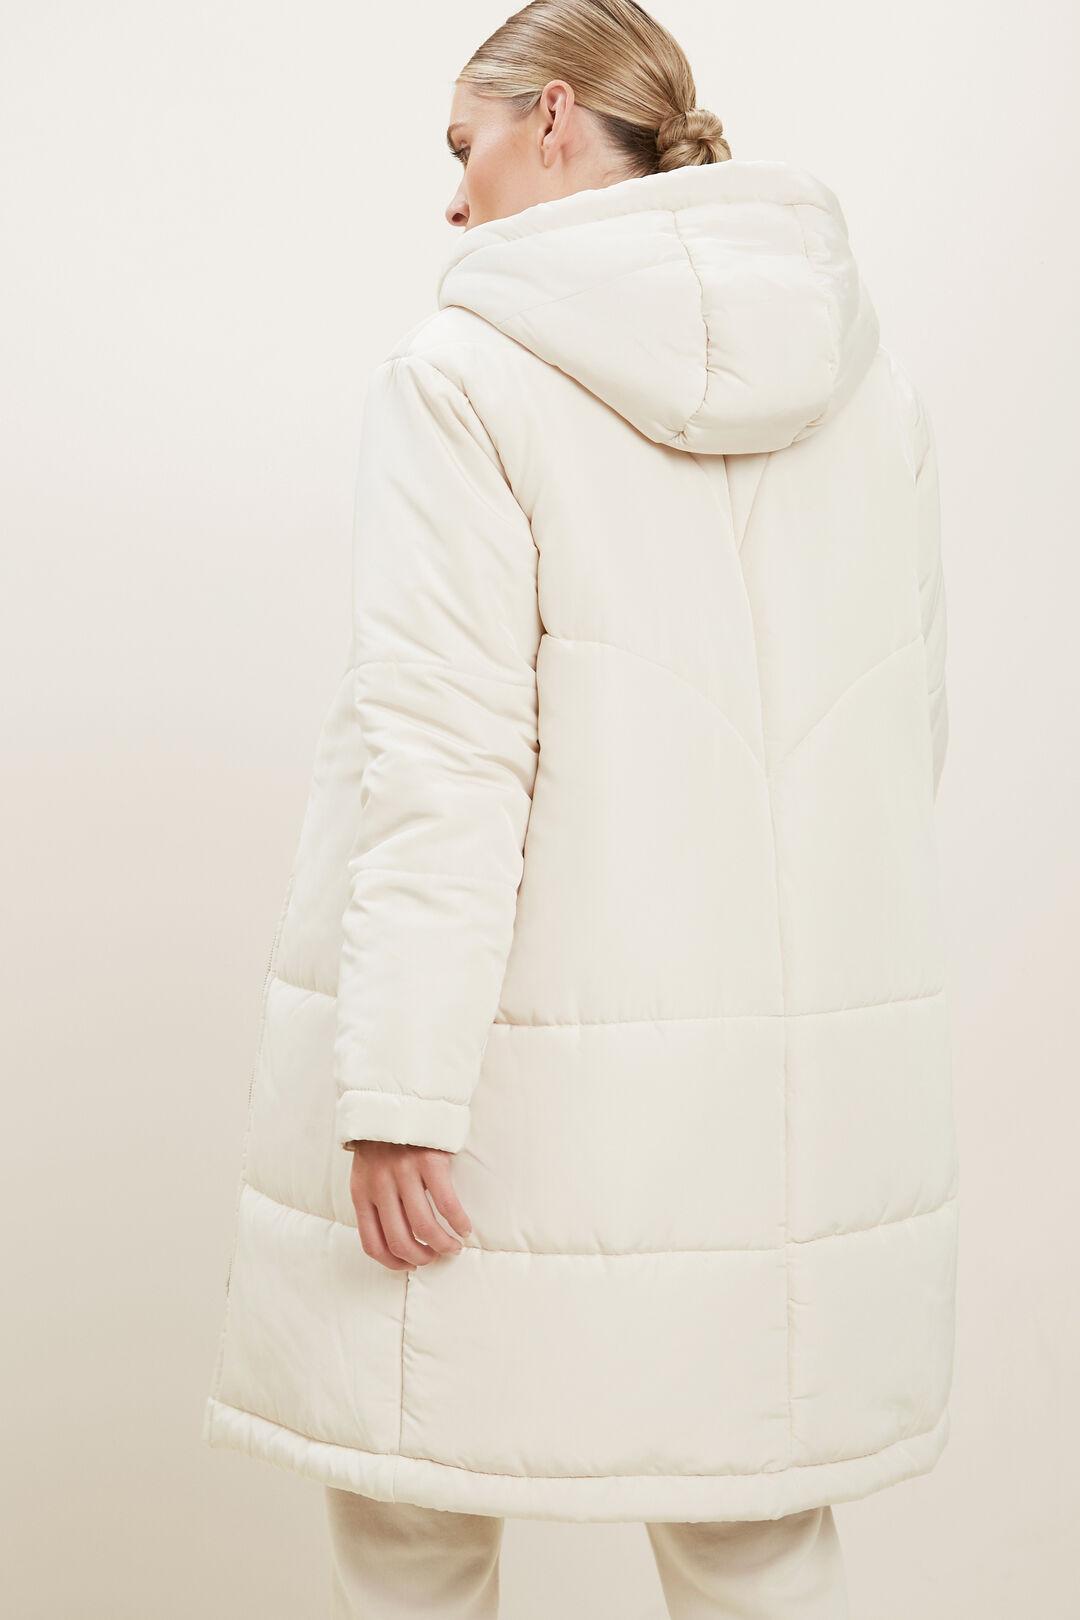 Longline Puffer Jacket  Pebble Cream  hi-res